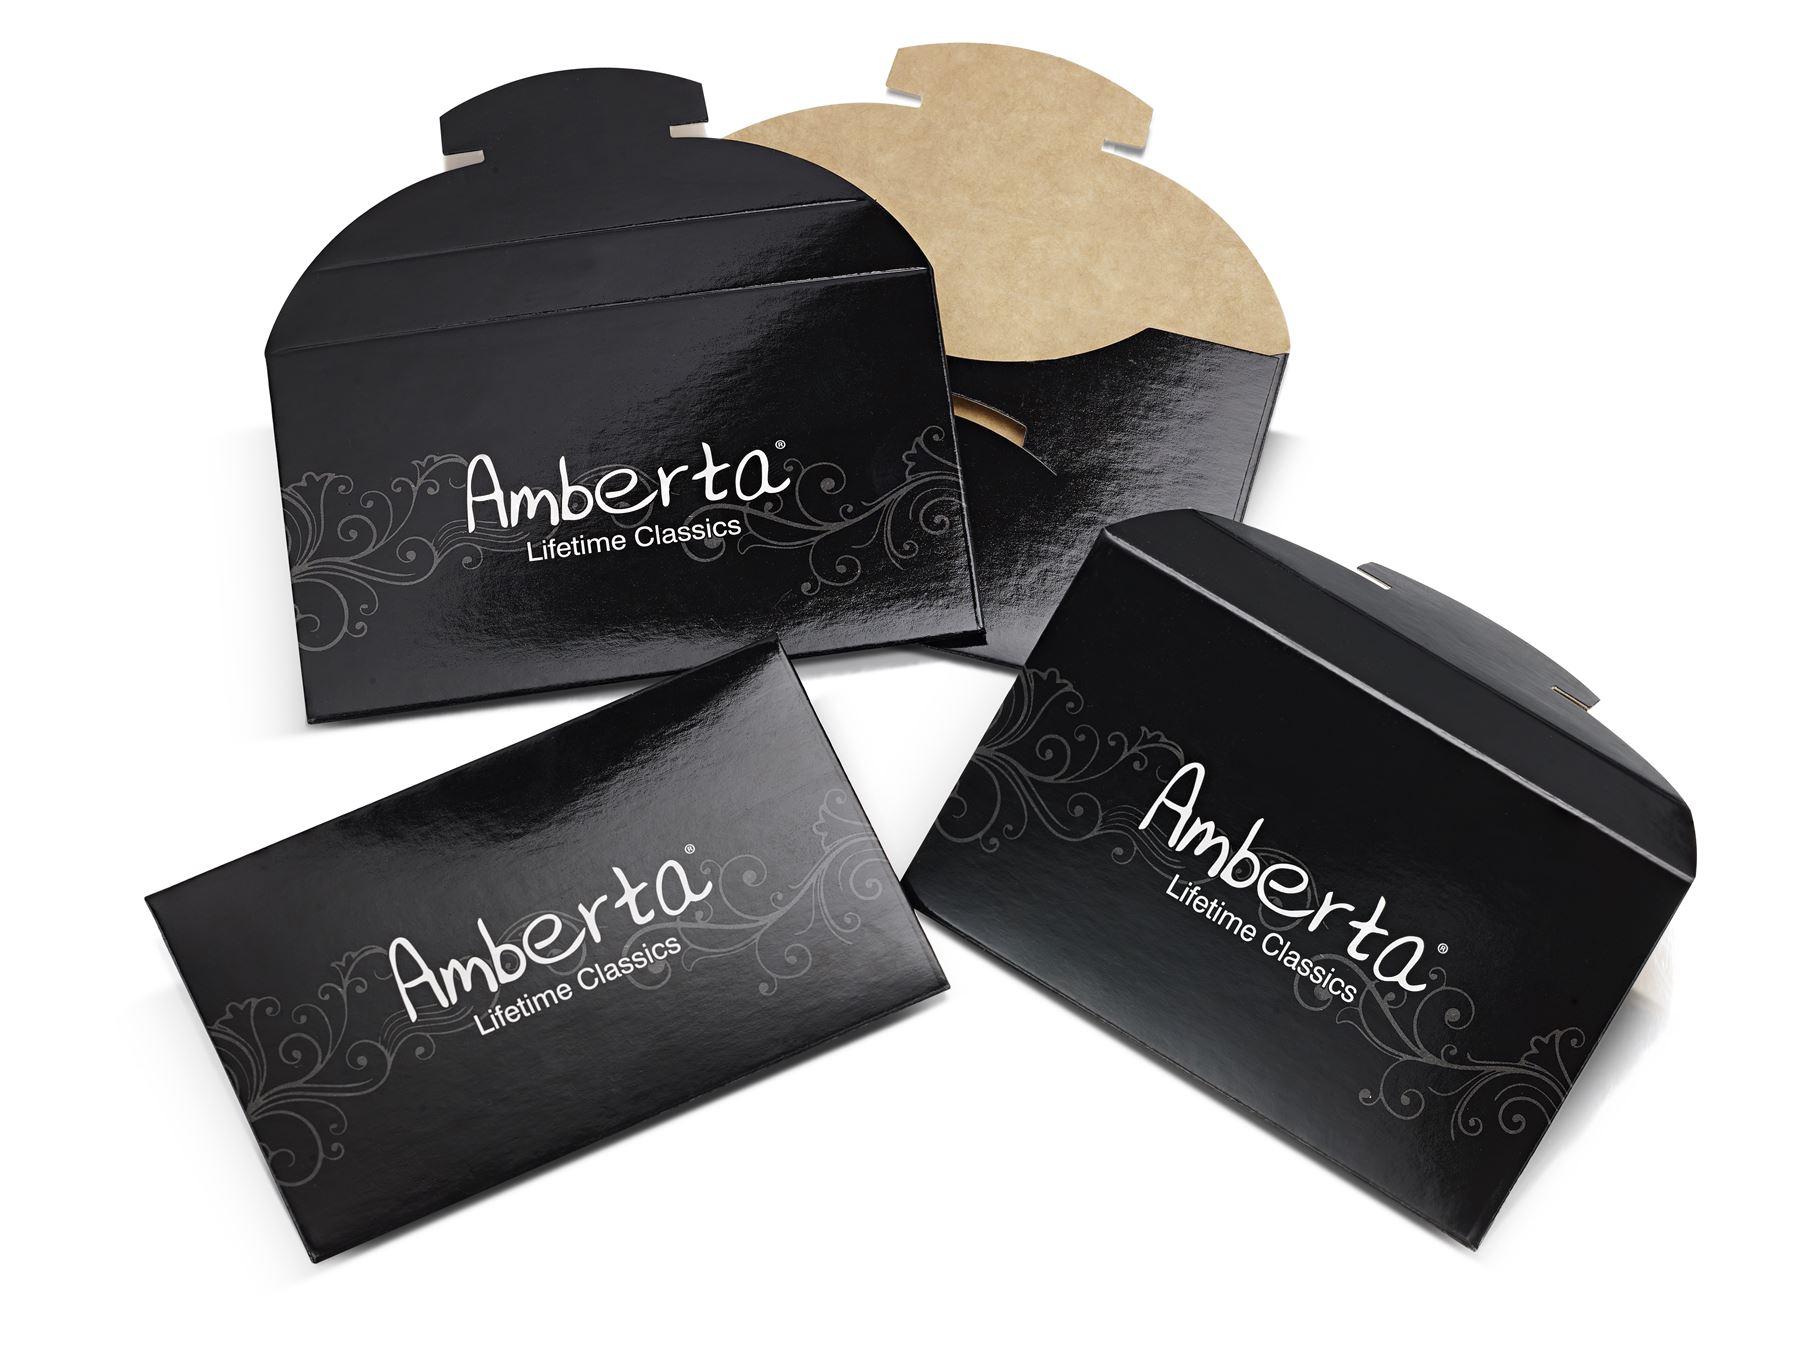 Amberta-Jewelry-925-Sterling-Silver-Adjustable-Bracelet-Italian-Bangle-for-Women thumbnail 4